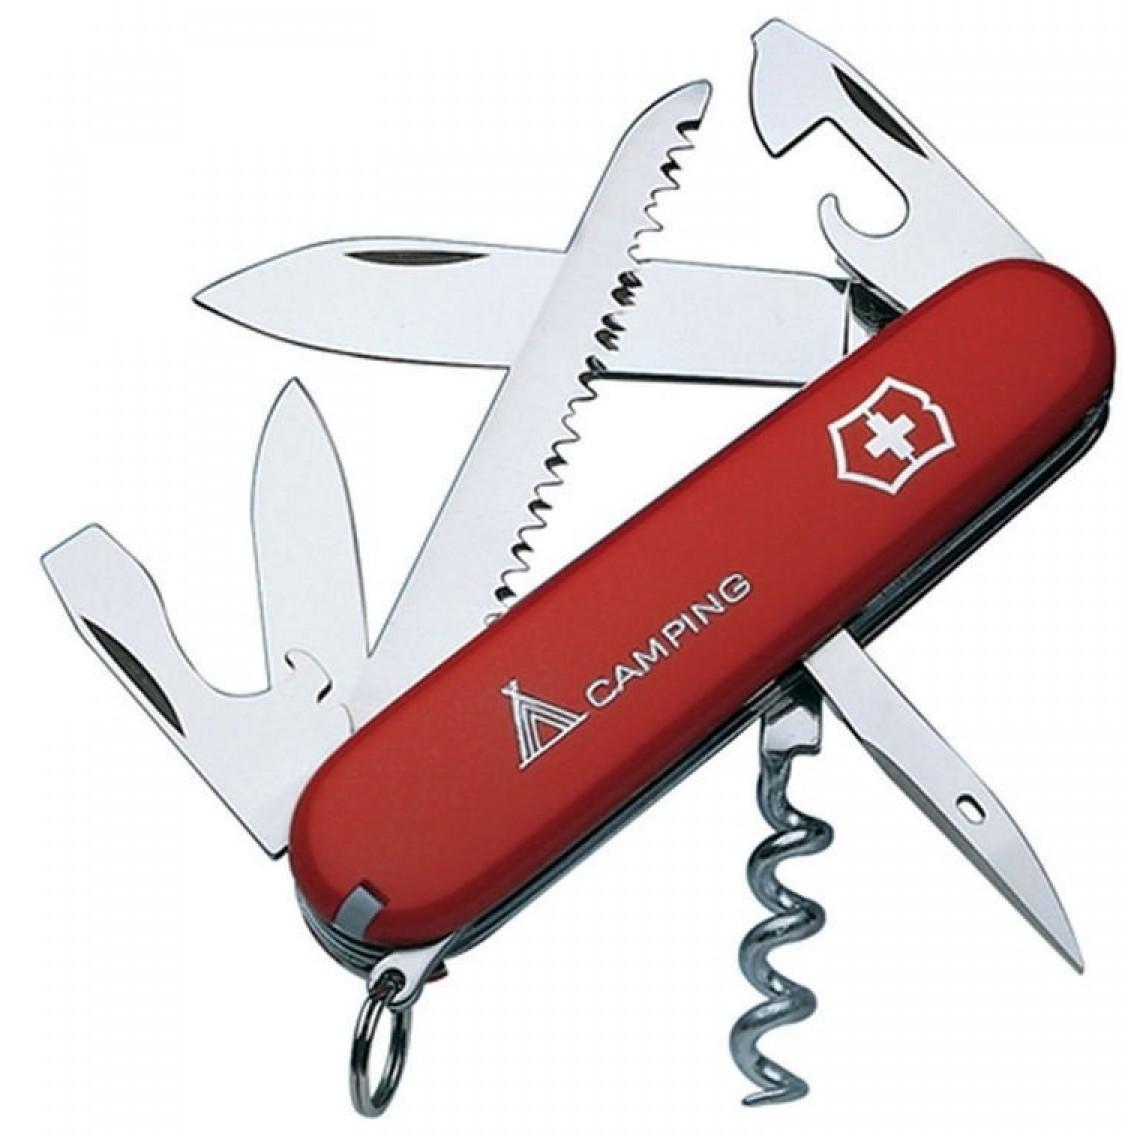 CamperМультитулы<br>Нож перочинный<br>